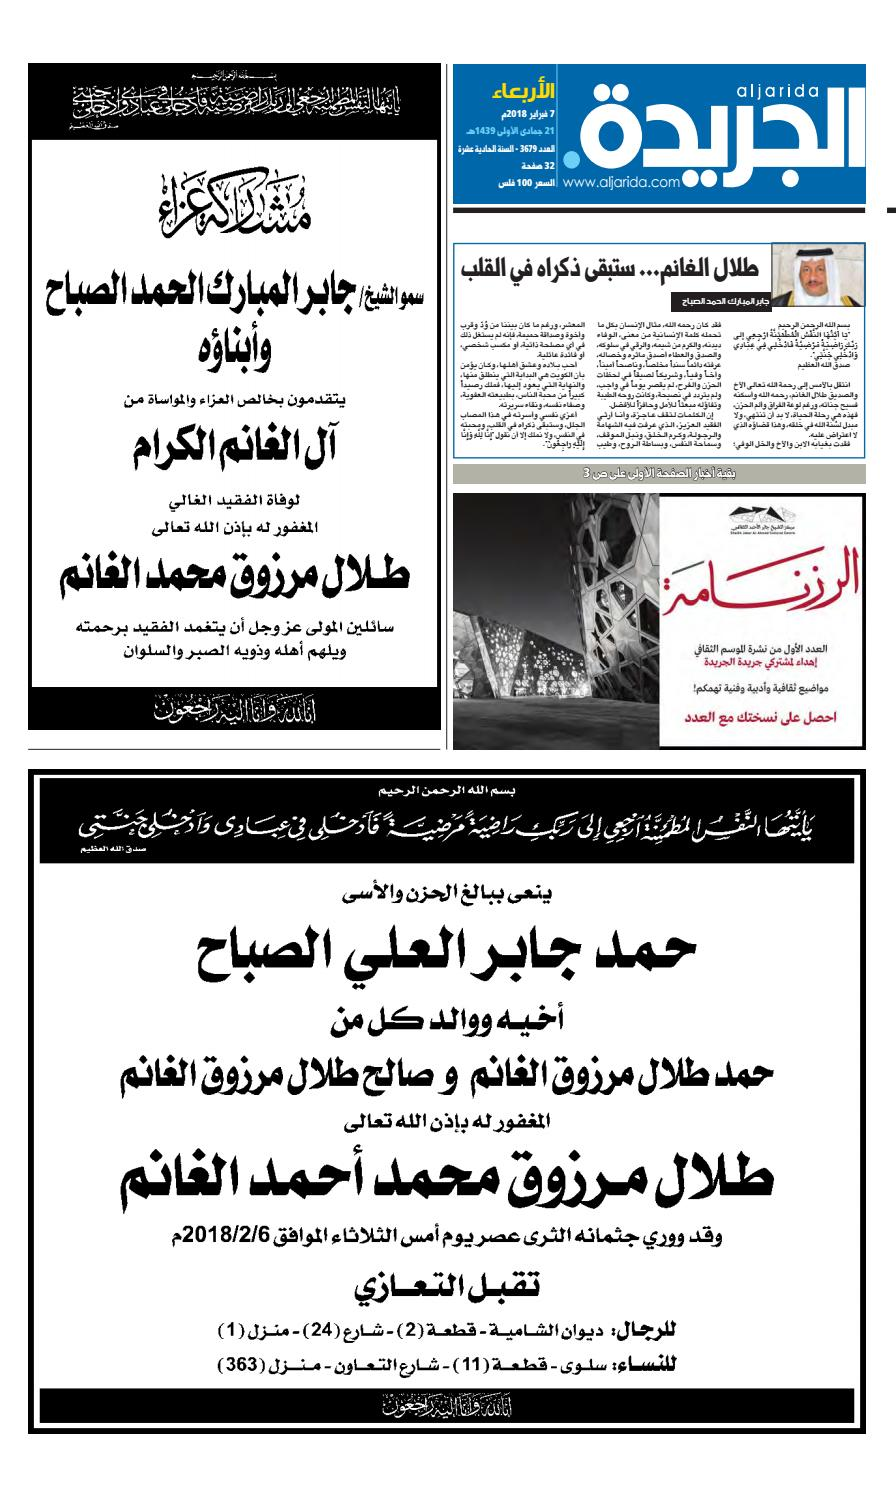 50dacb015 عدد الجريدة الاربعاء 7 فبراير 2018 by Aljarida Newspaper - issuu